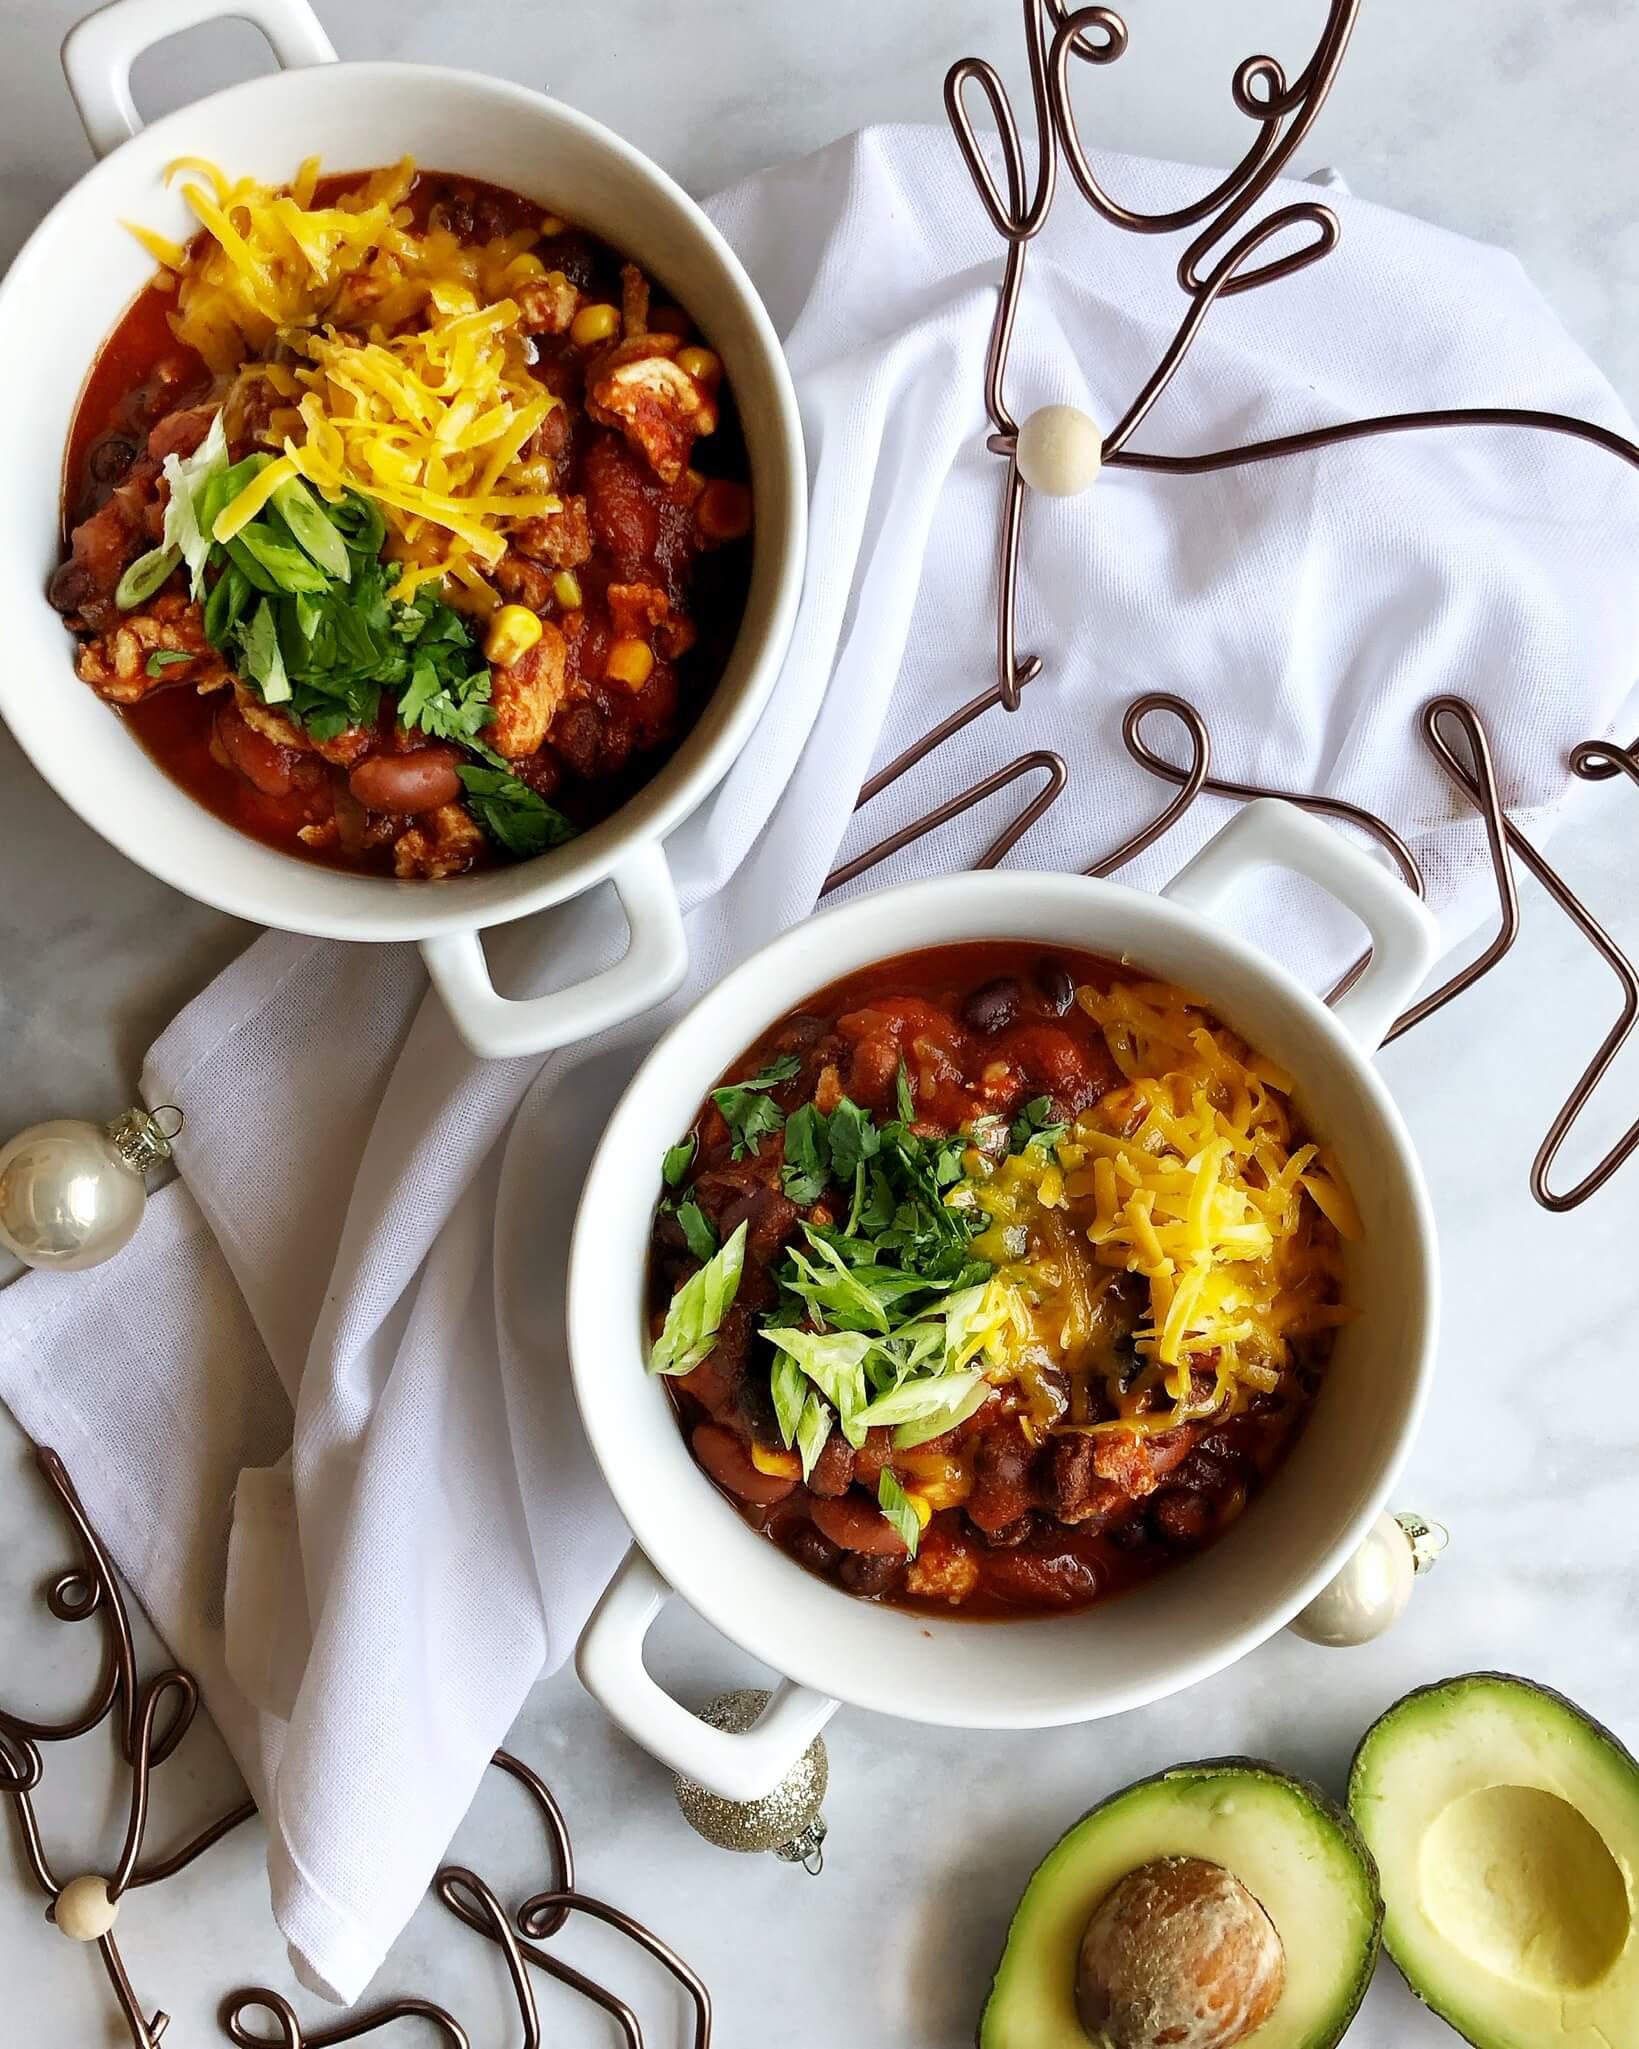 Slow cooker turkey mince chili